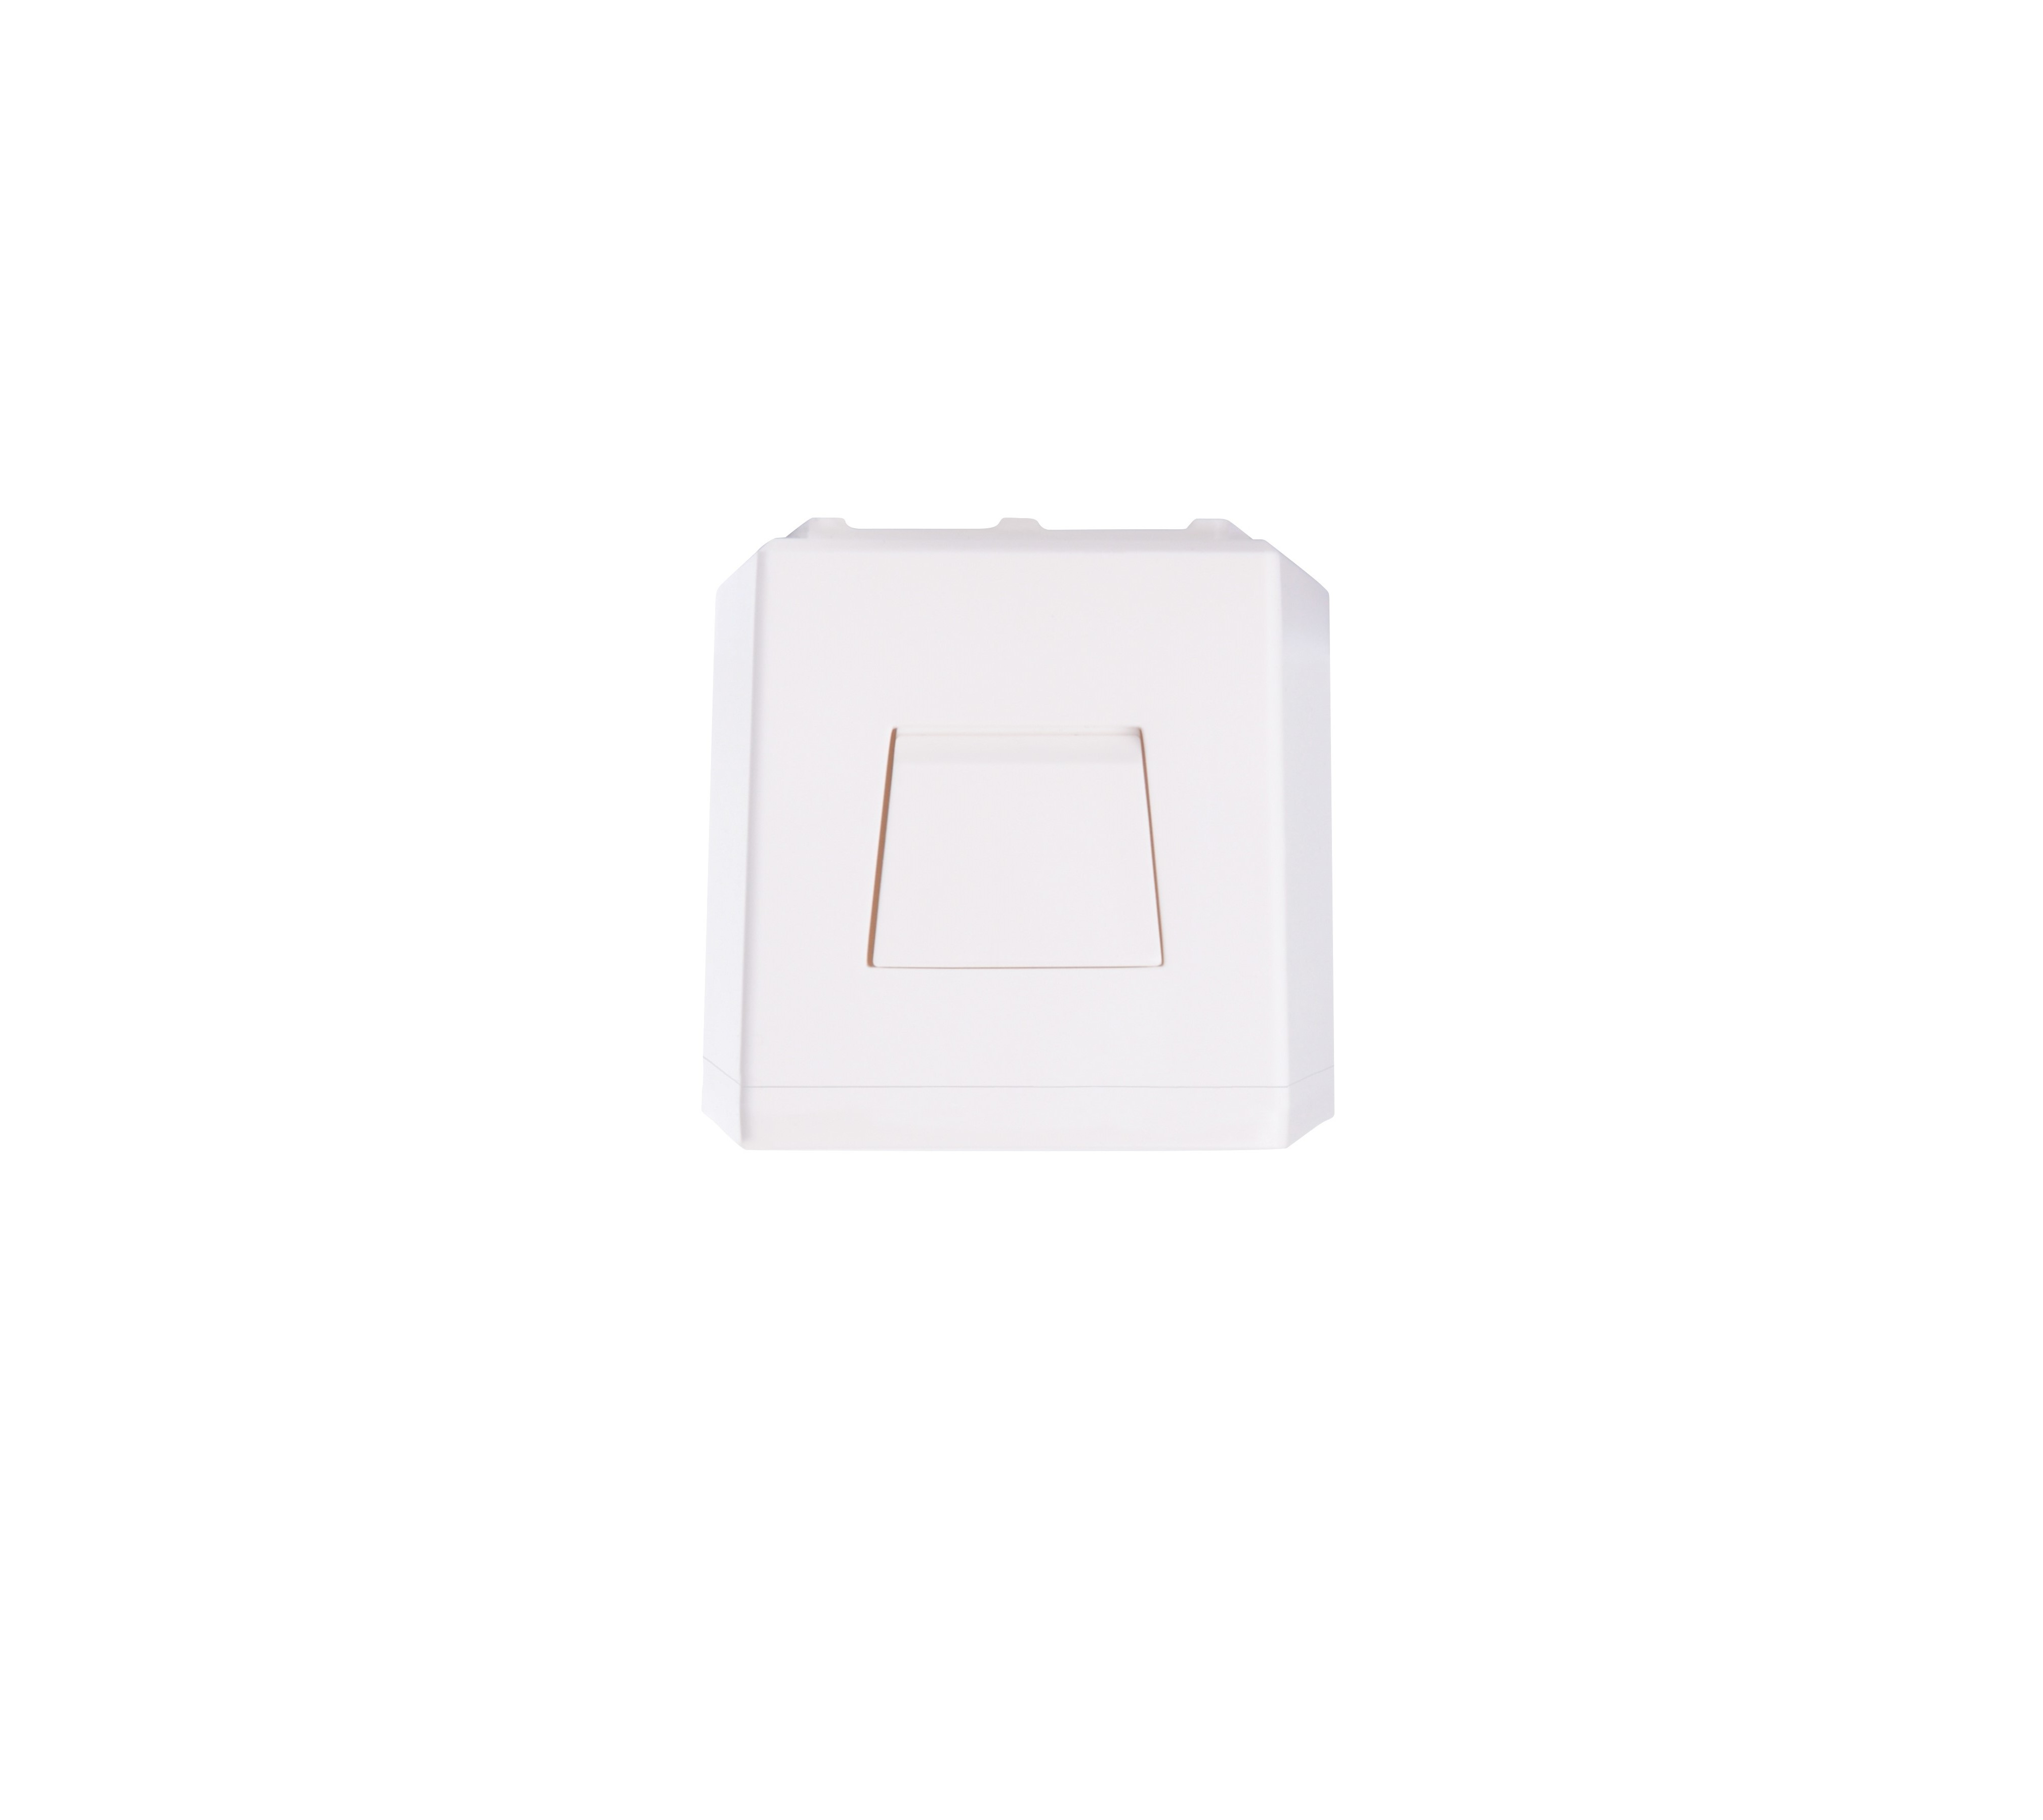 Lampa antipanica led Intelight 94717   3h nementinut test automat 1